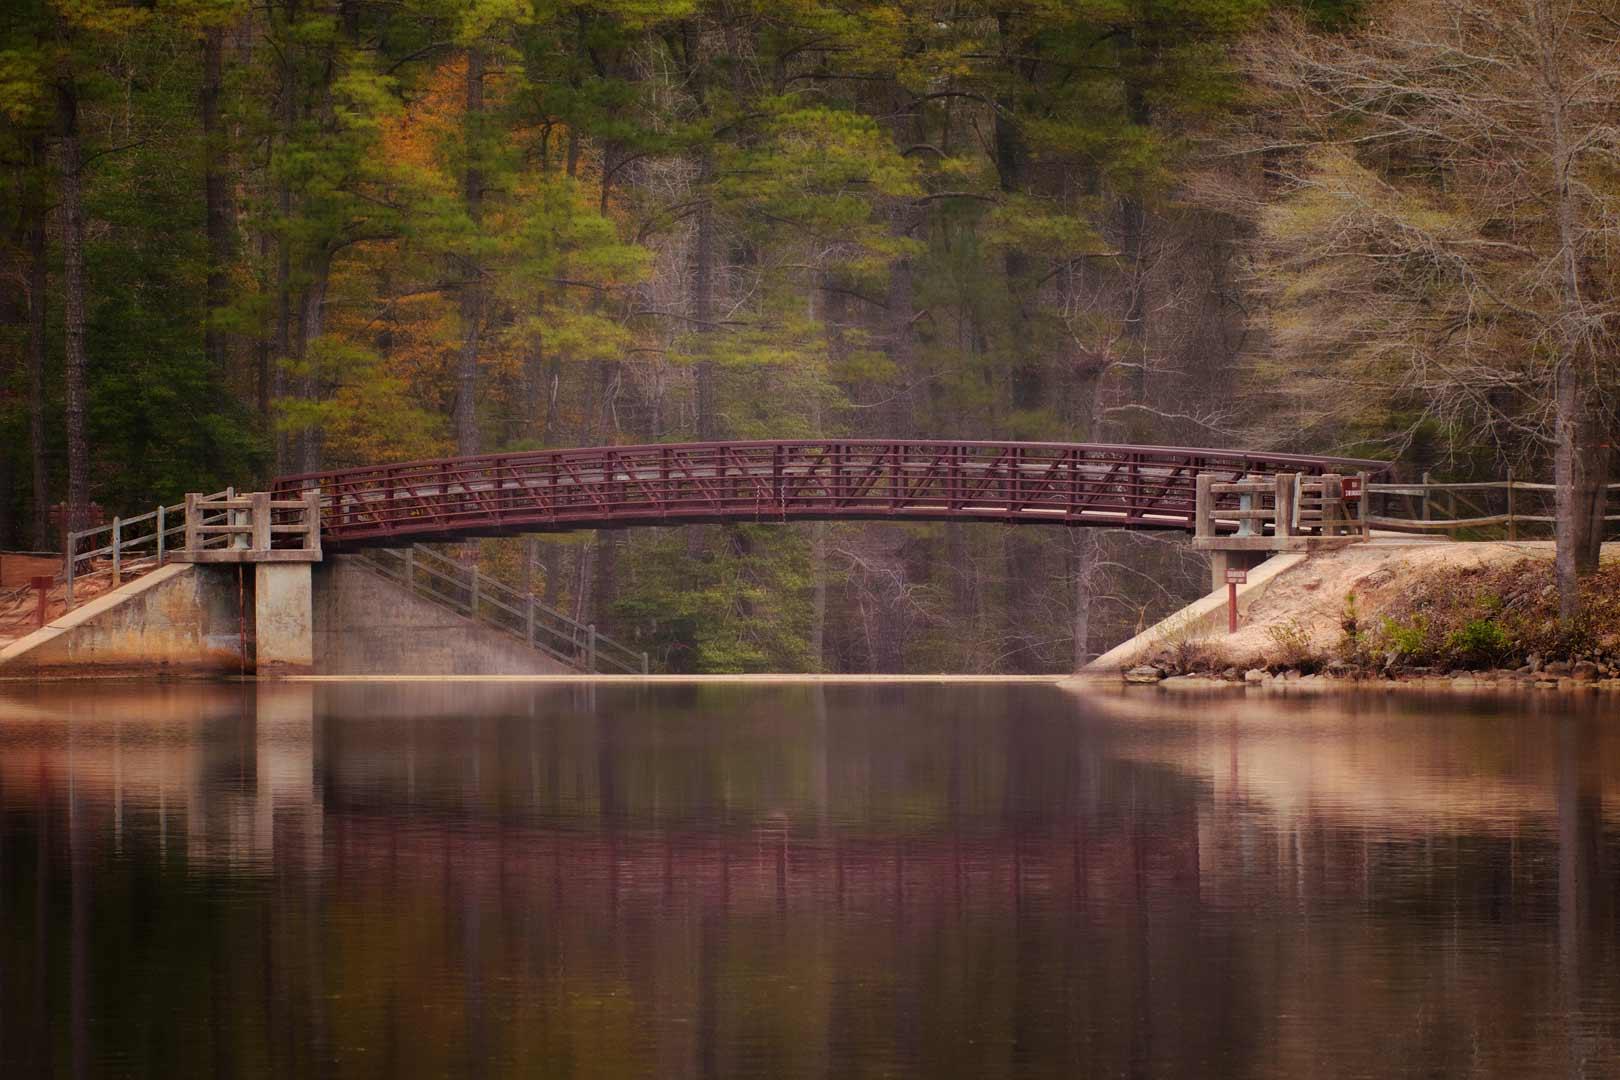 Cheraw park Bridge